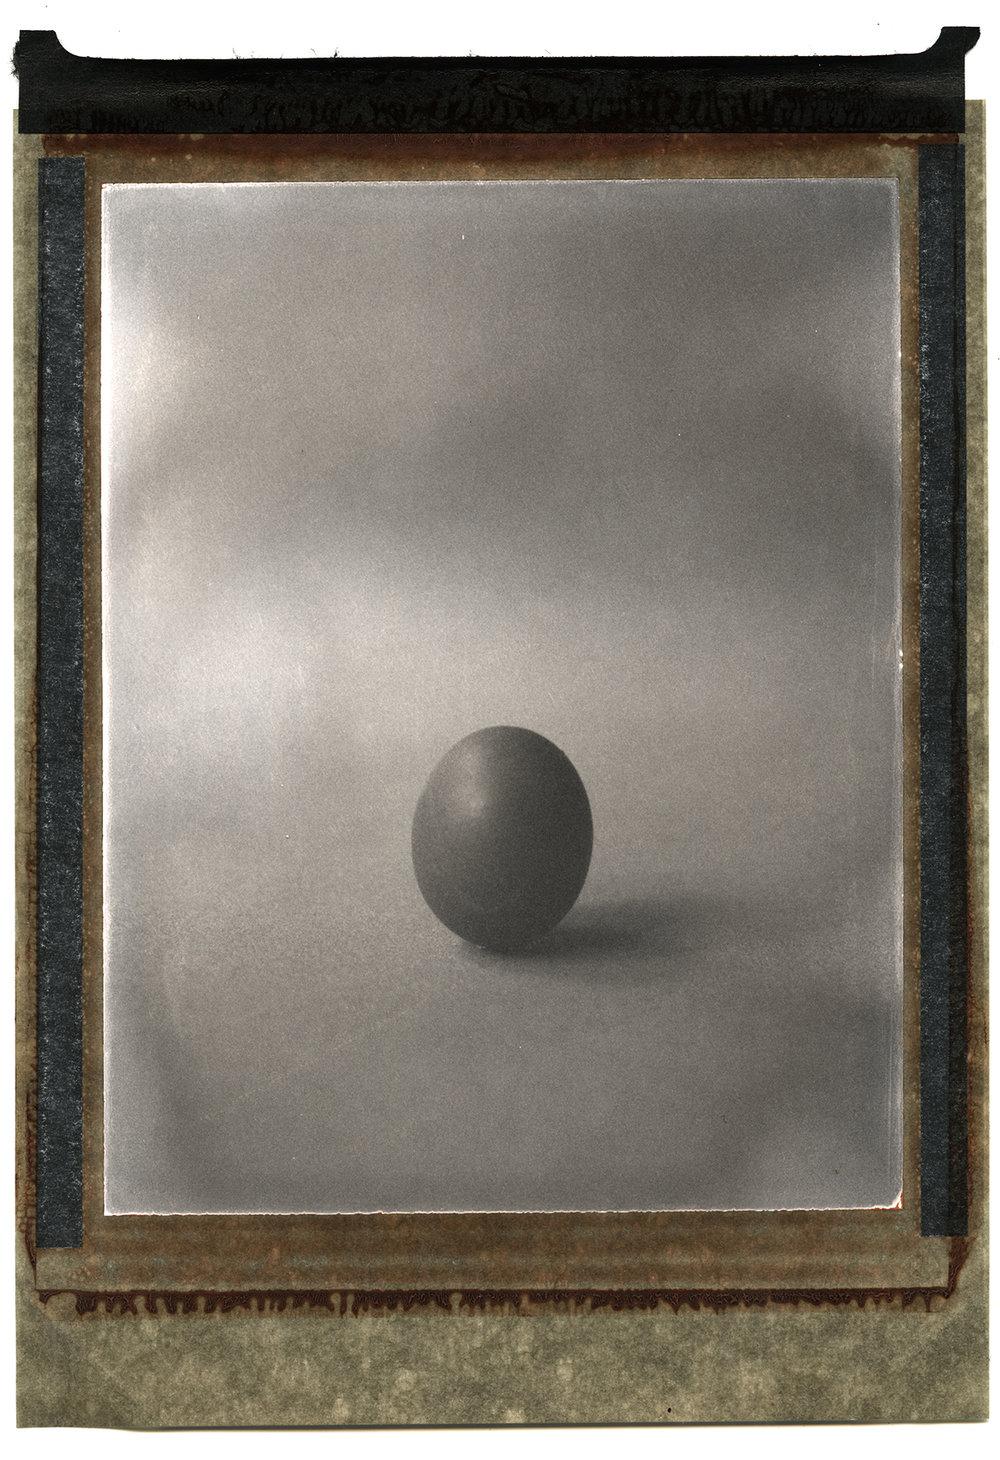 Beyond the Egg | Chamonix 4x5 | Polaroid Type 5 | Davide Maria Ferrari